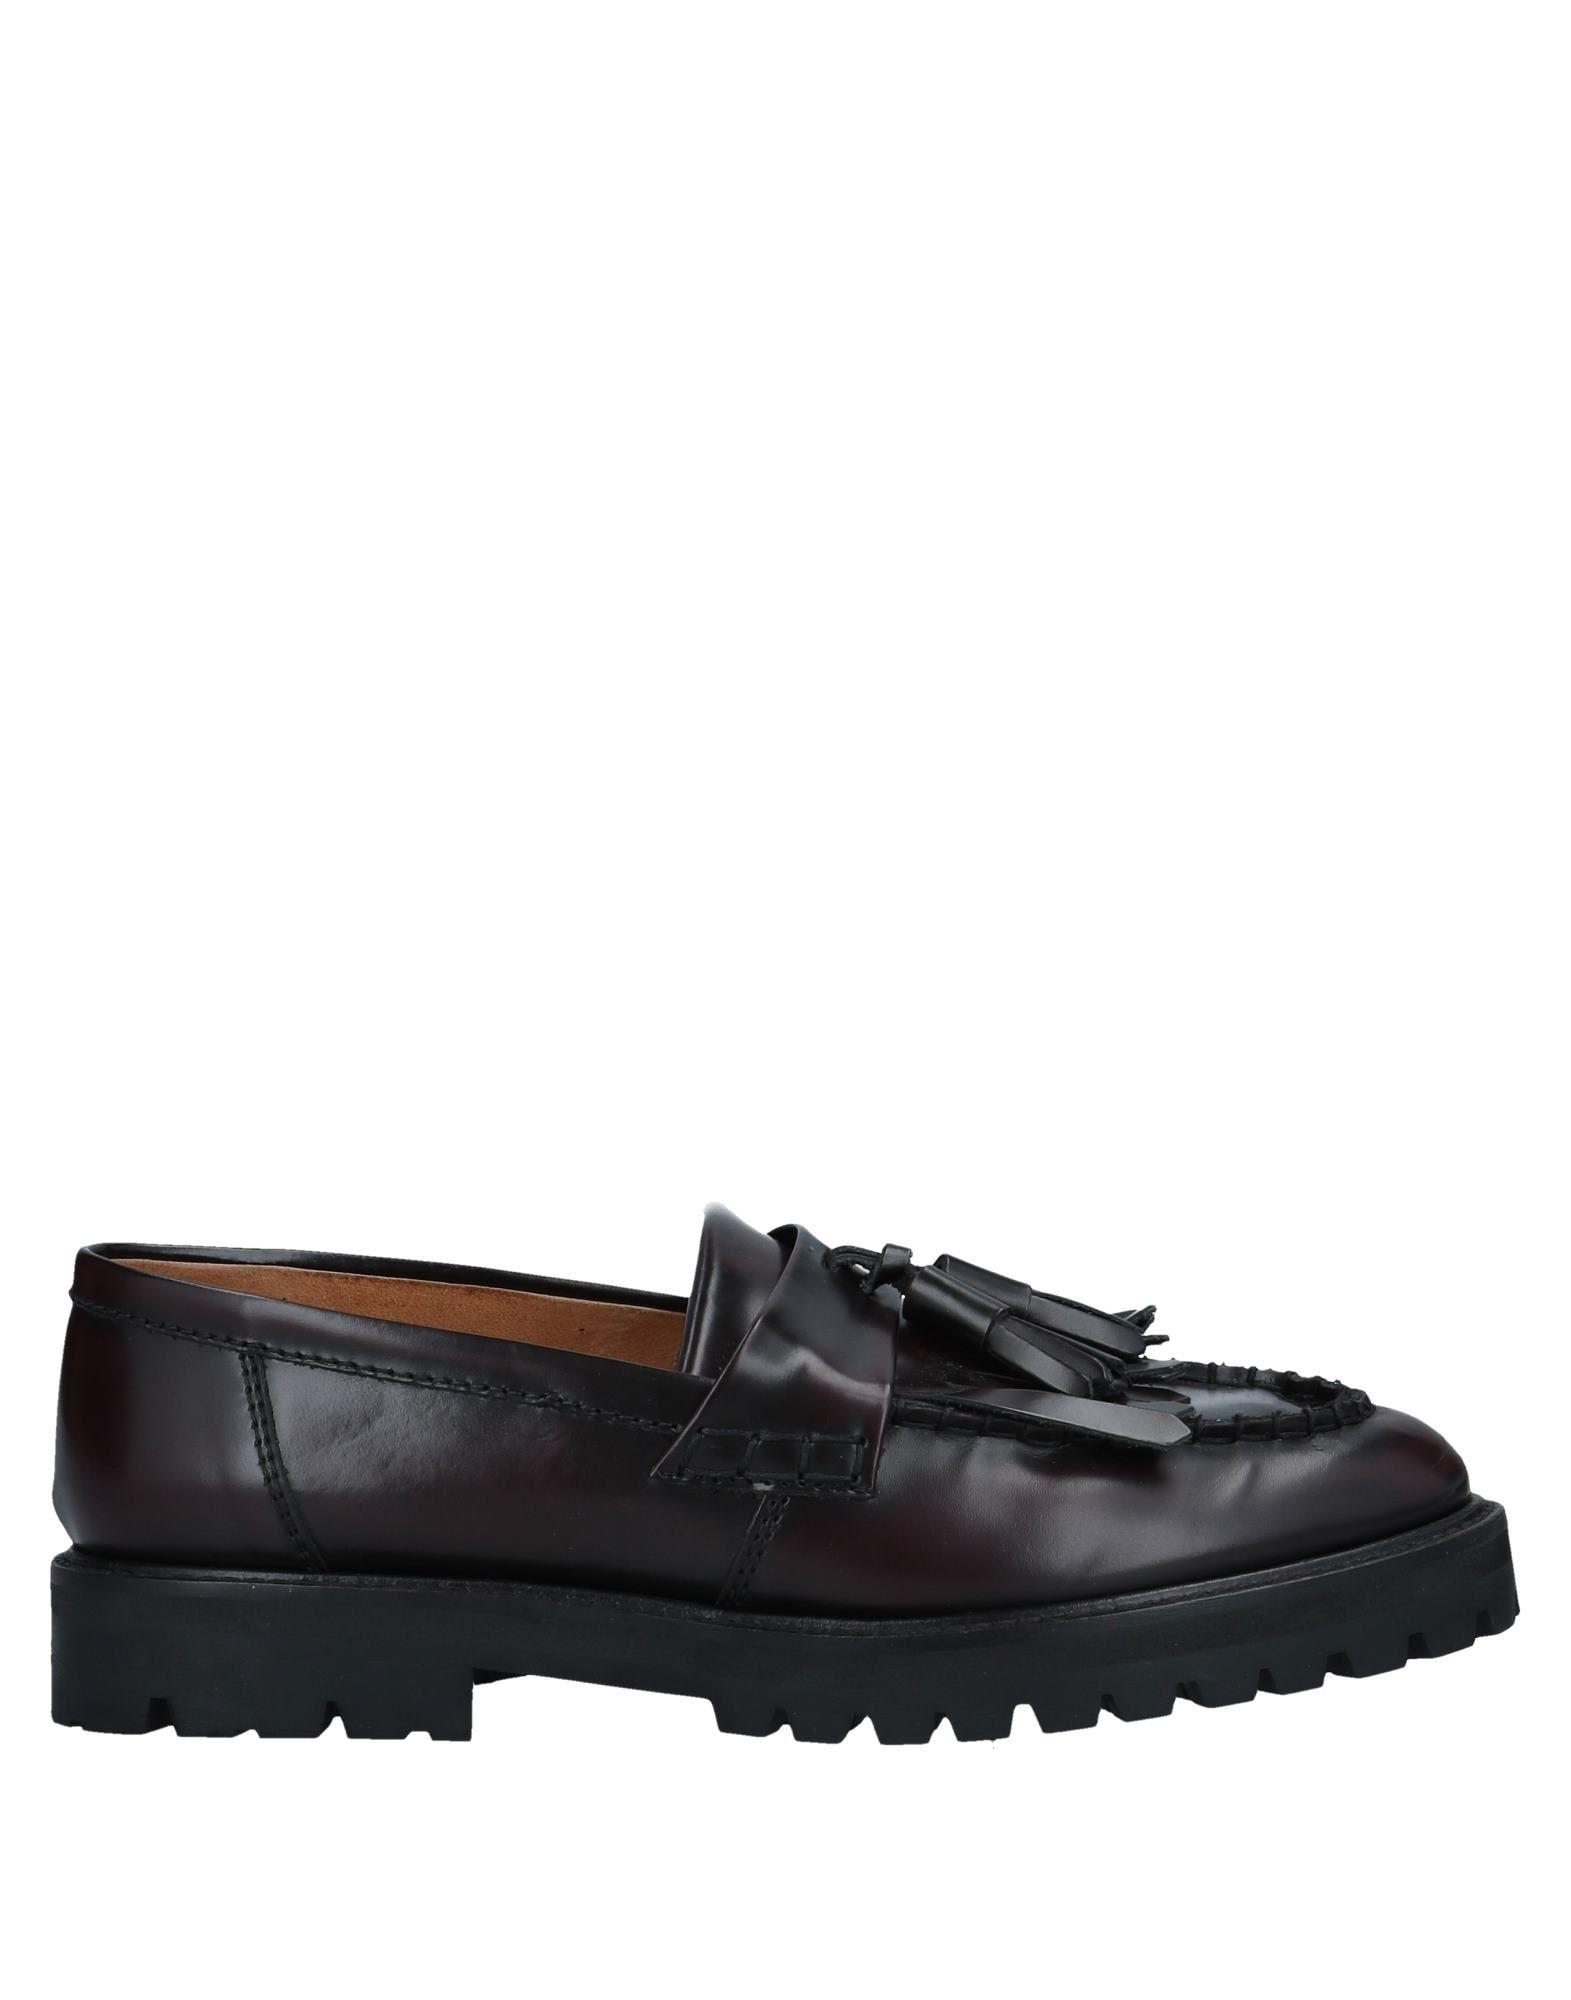 Stilvolle billige Schuhe Liviana Conti Mokassins Damen  11554460SR